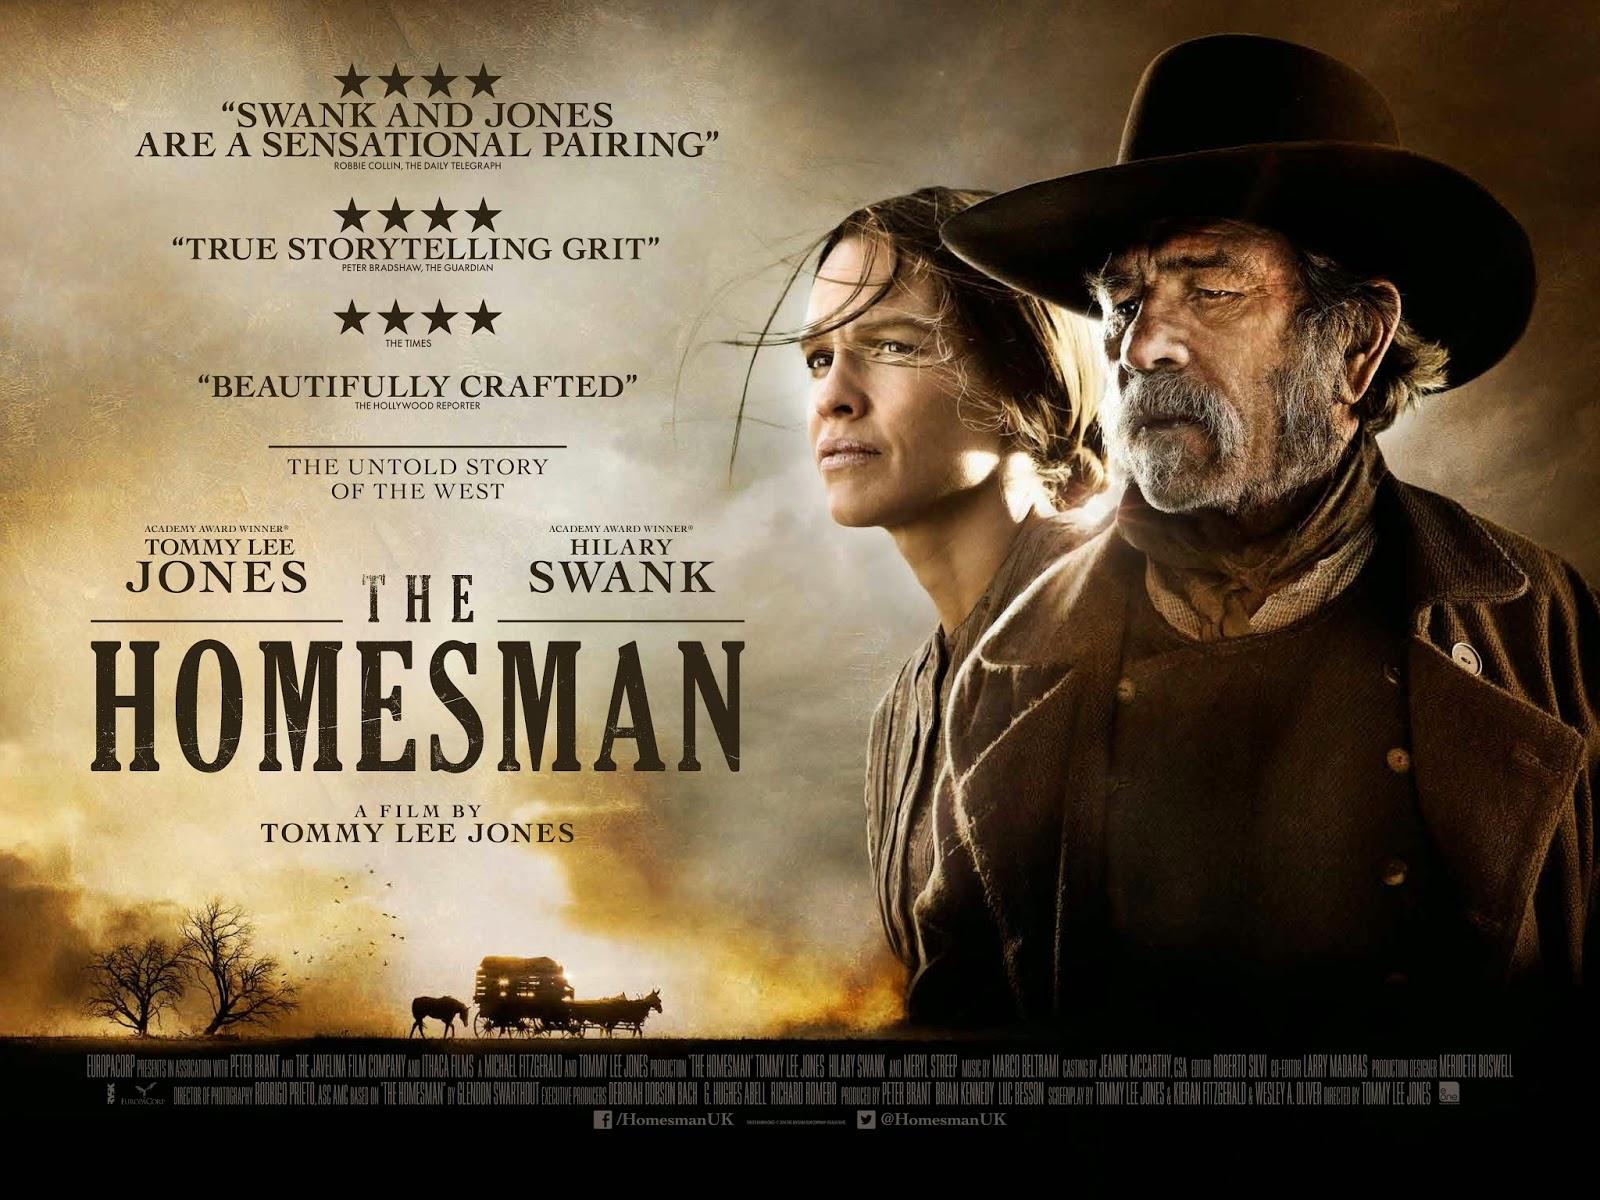 moja filmoteka blog filmowy THE HOMESMAN [2014]